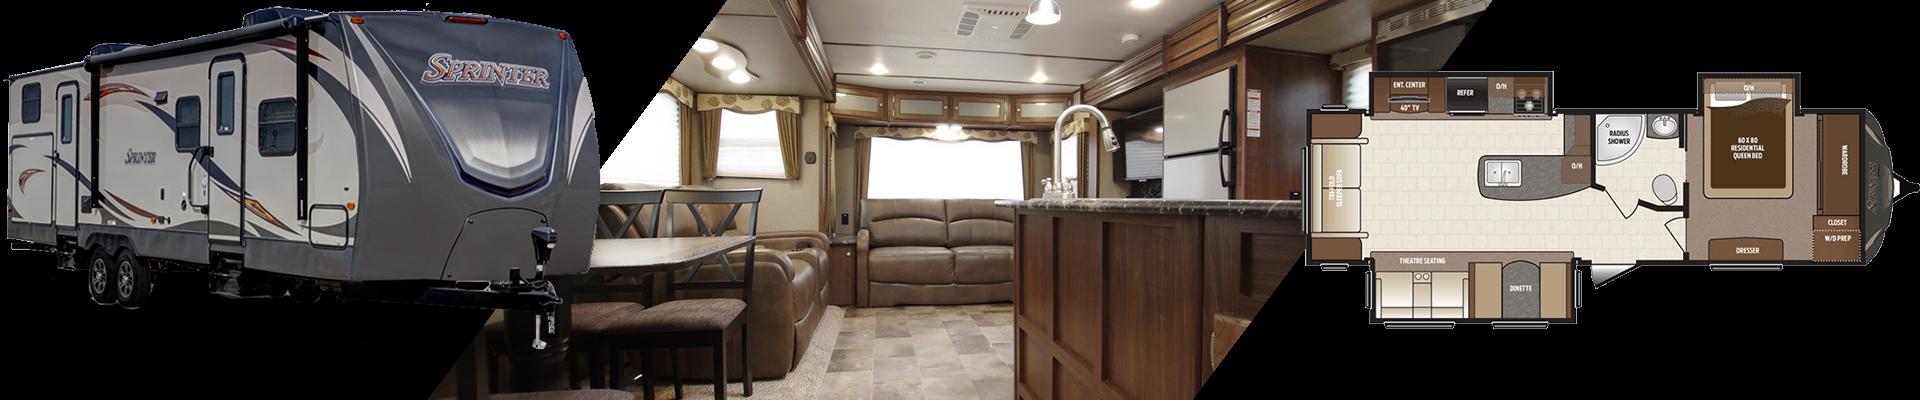 Keystone Sprinter travel trailer - interior, exterior and floorplan views.